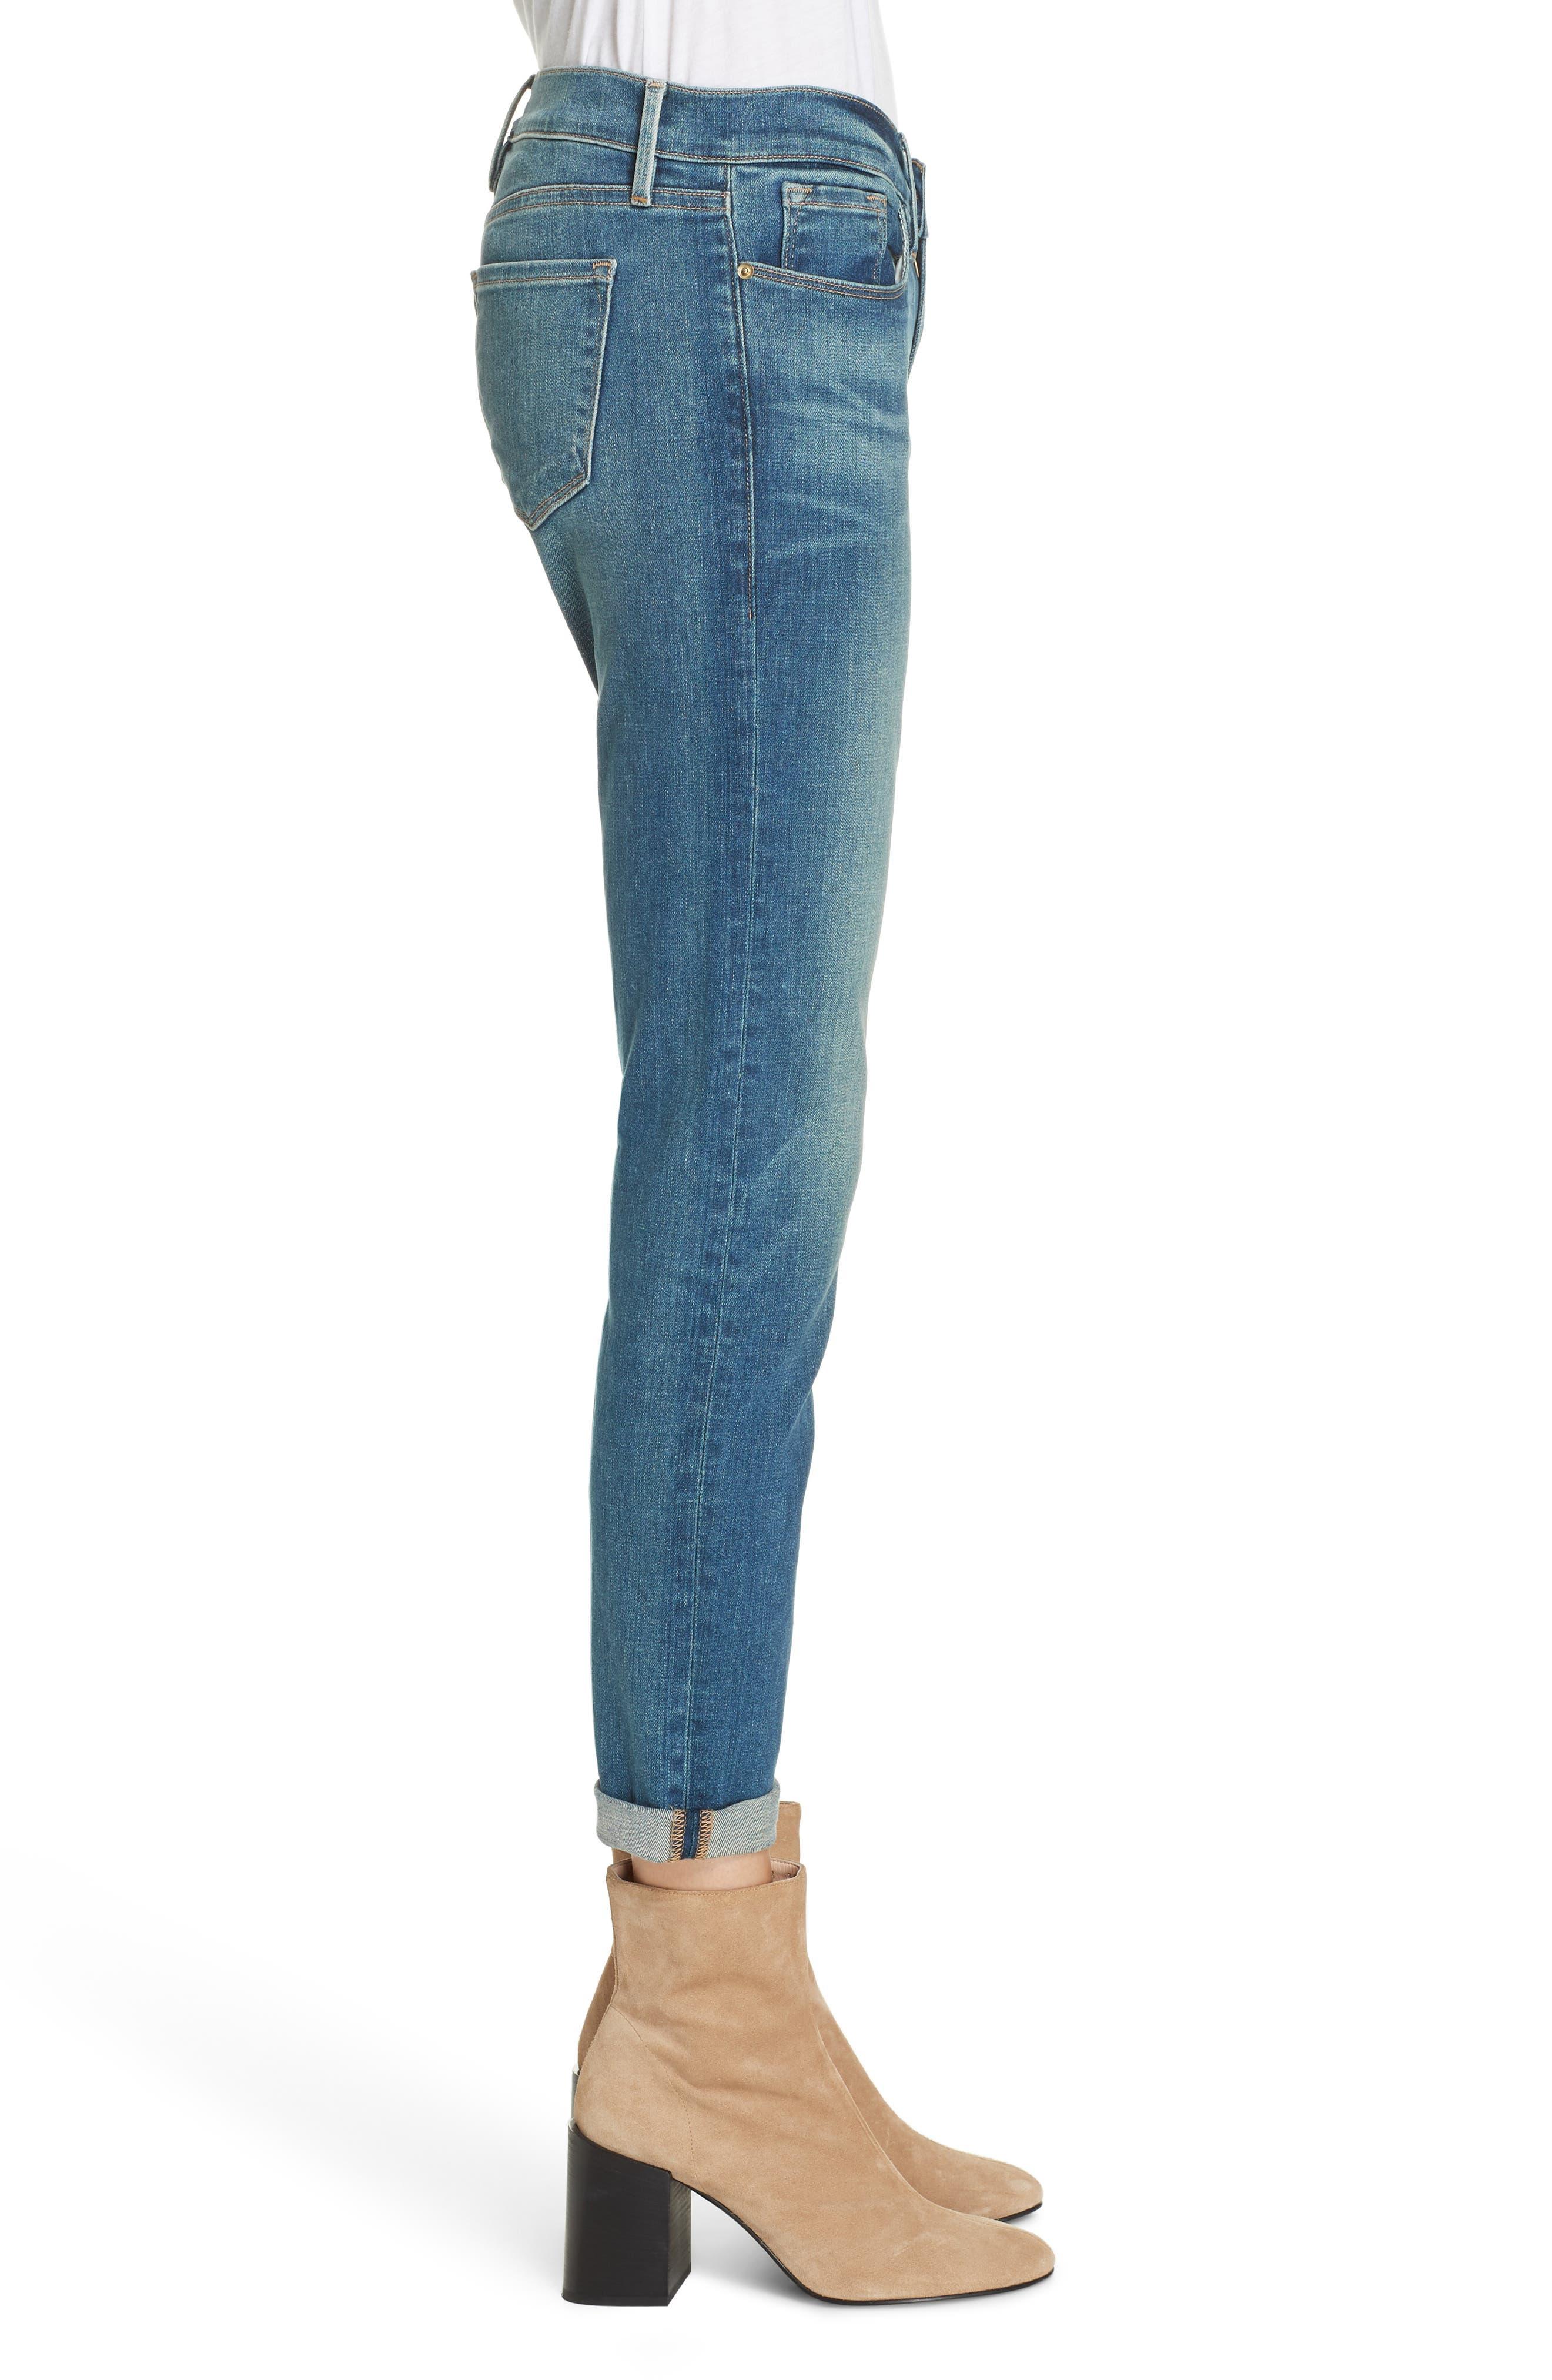 Le Garcon Slim Boyfriend Jeans,                             Alternate thumbnail 3, color,                             BERKLEY SQUARE